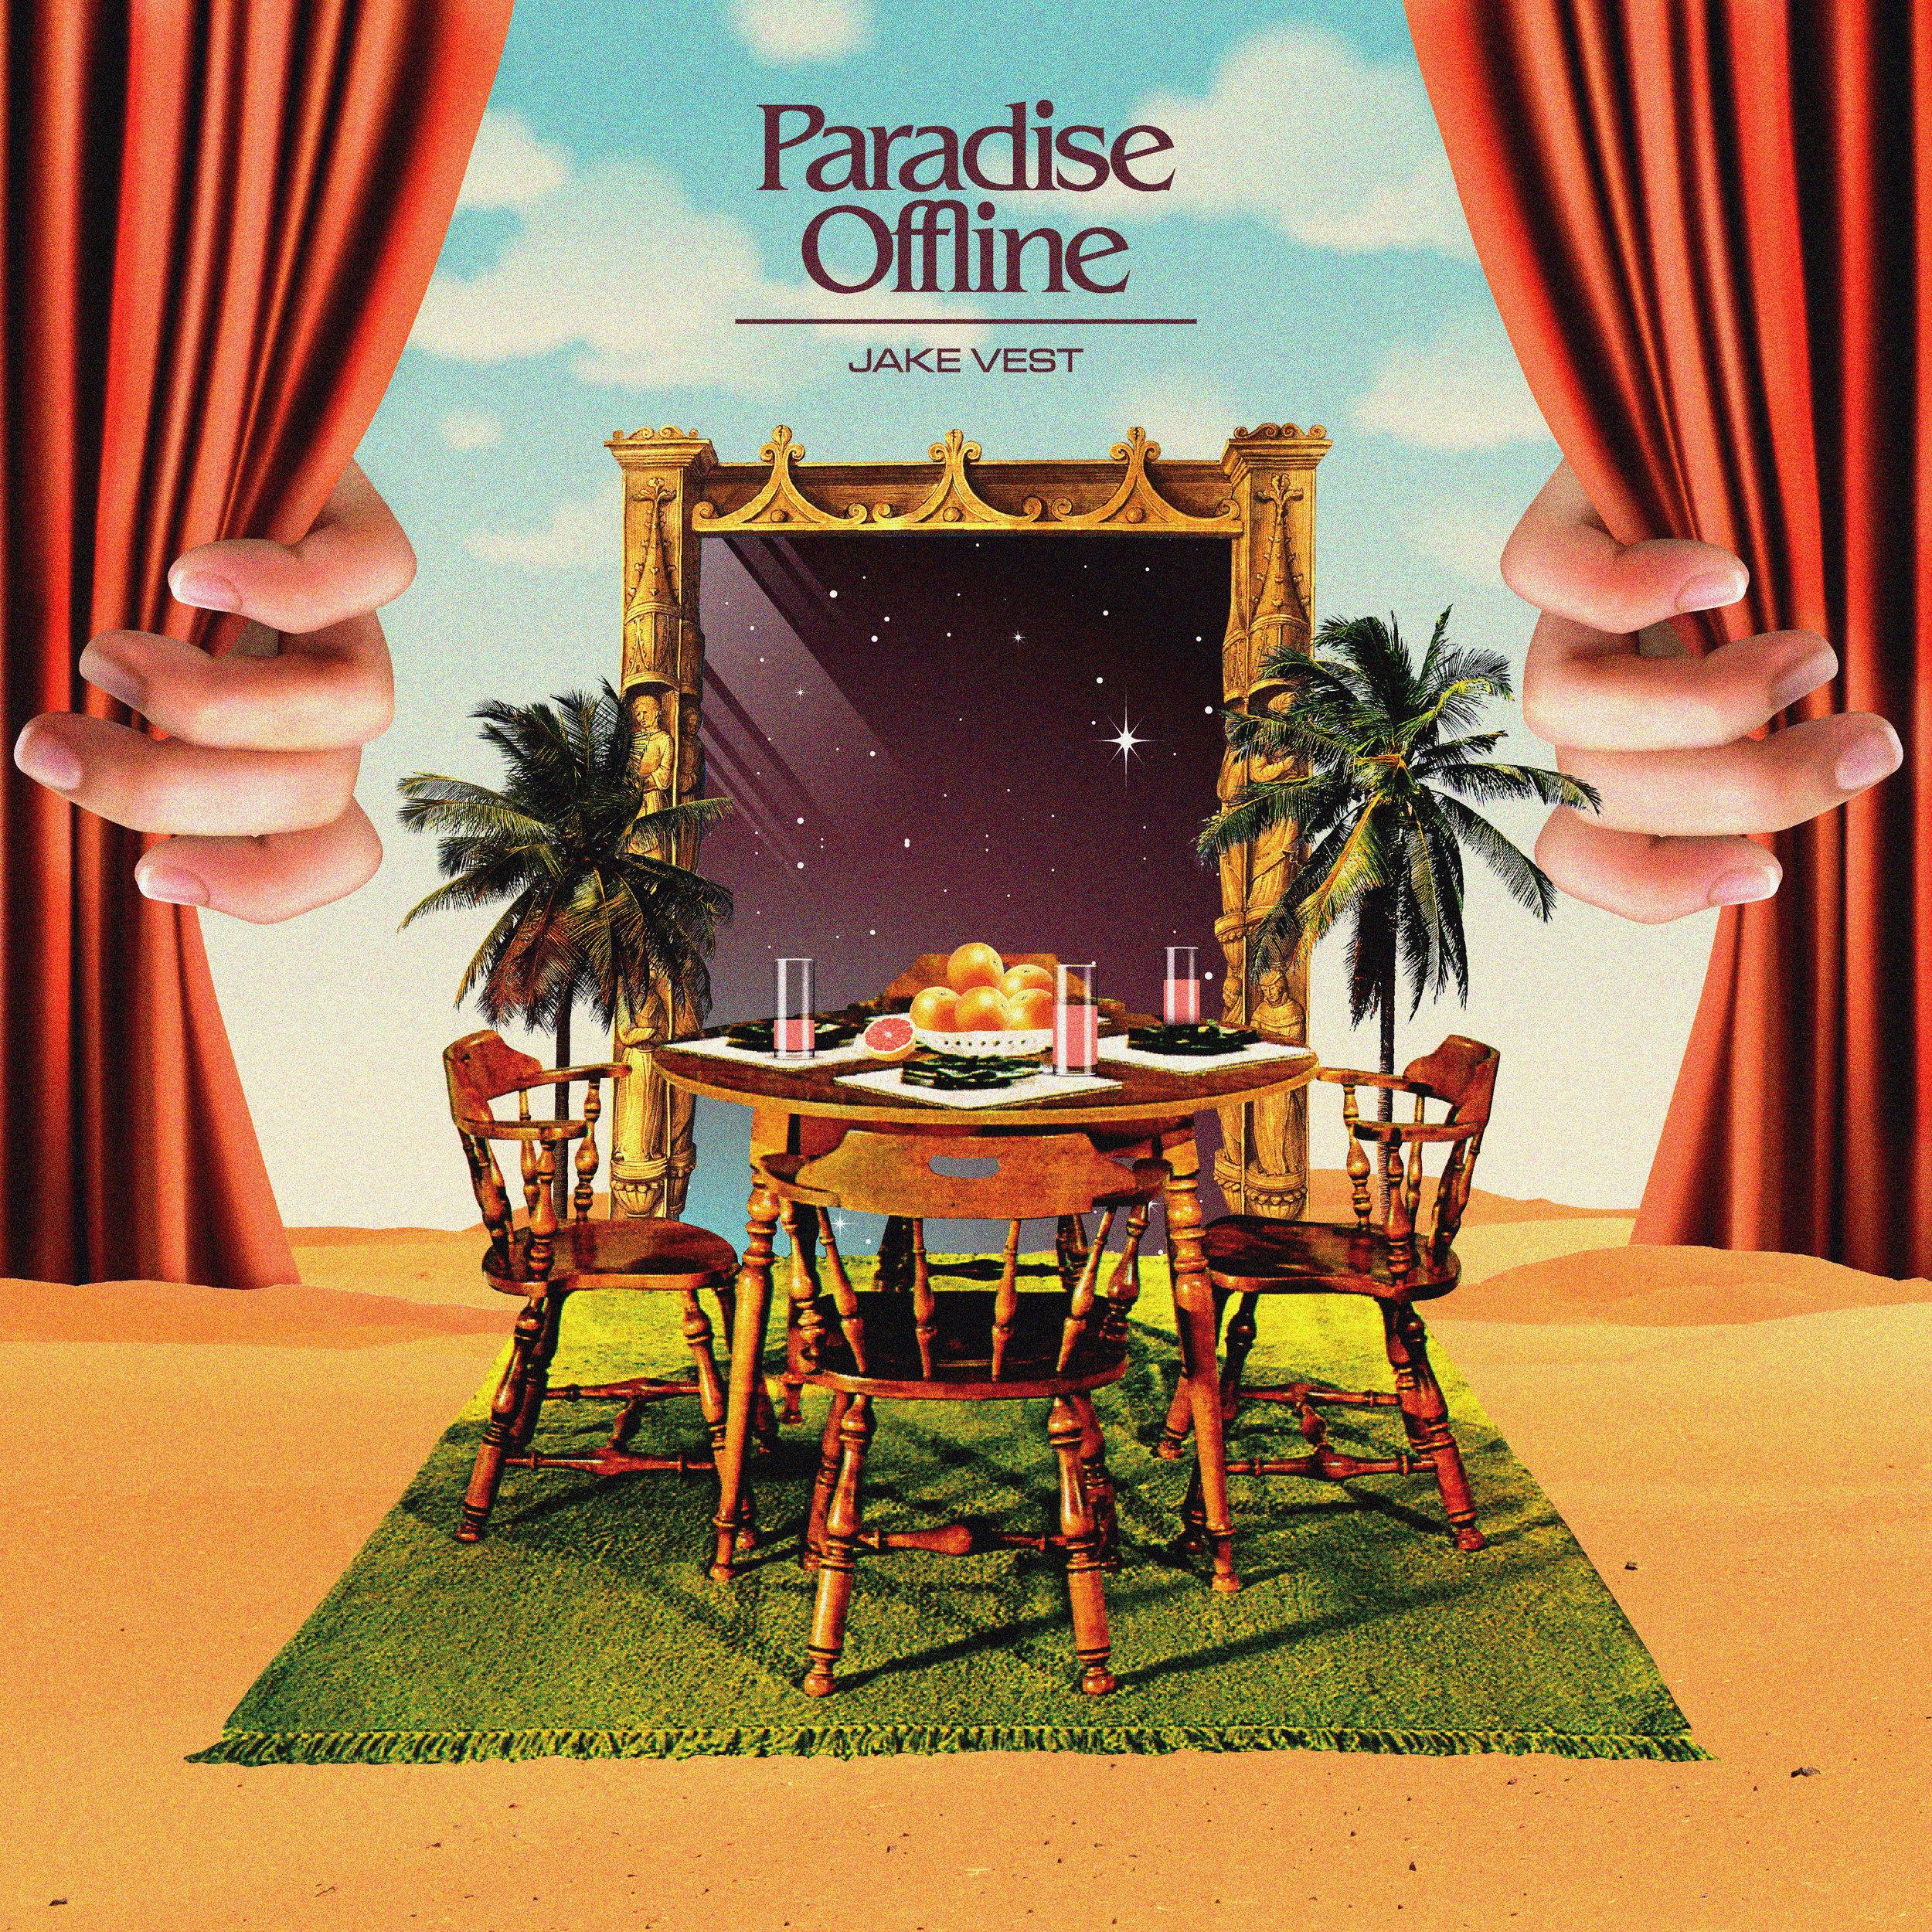 JV-ParadiseOffline-3K-051919.jpg